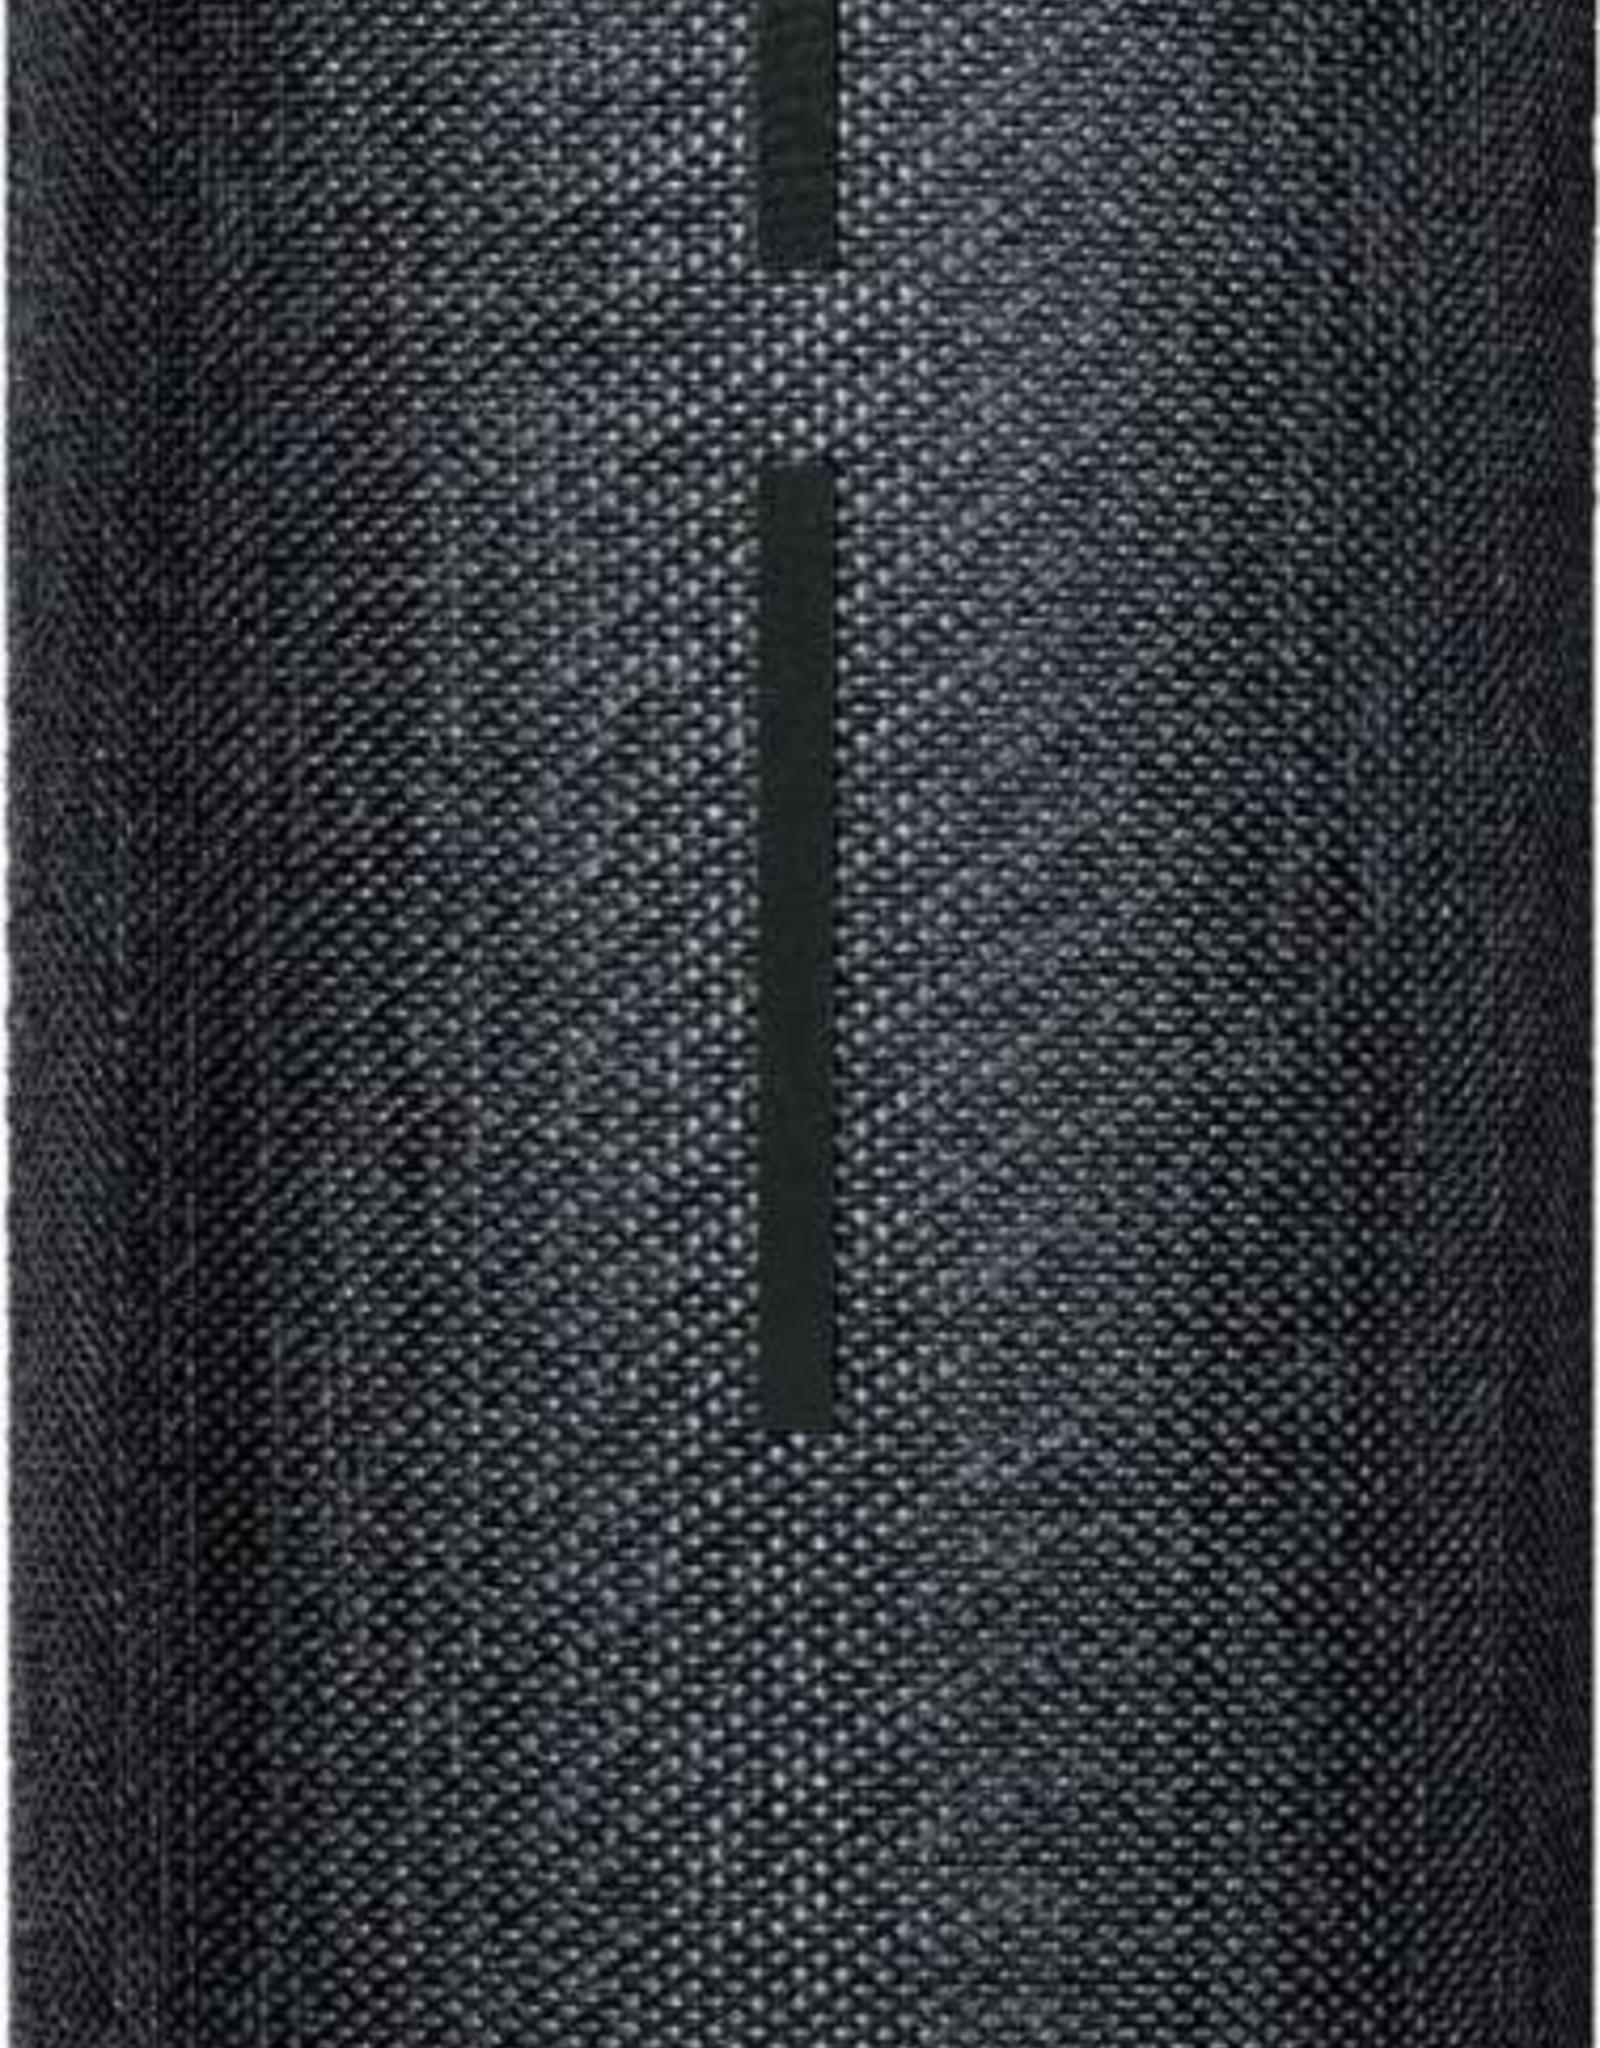 Ultimate Ears | Megaboom 3 Wireless Bluetooth Speaker-Night Black | 984001390